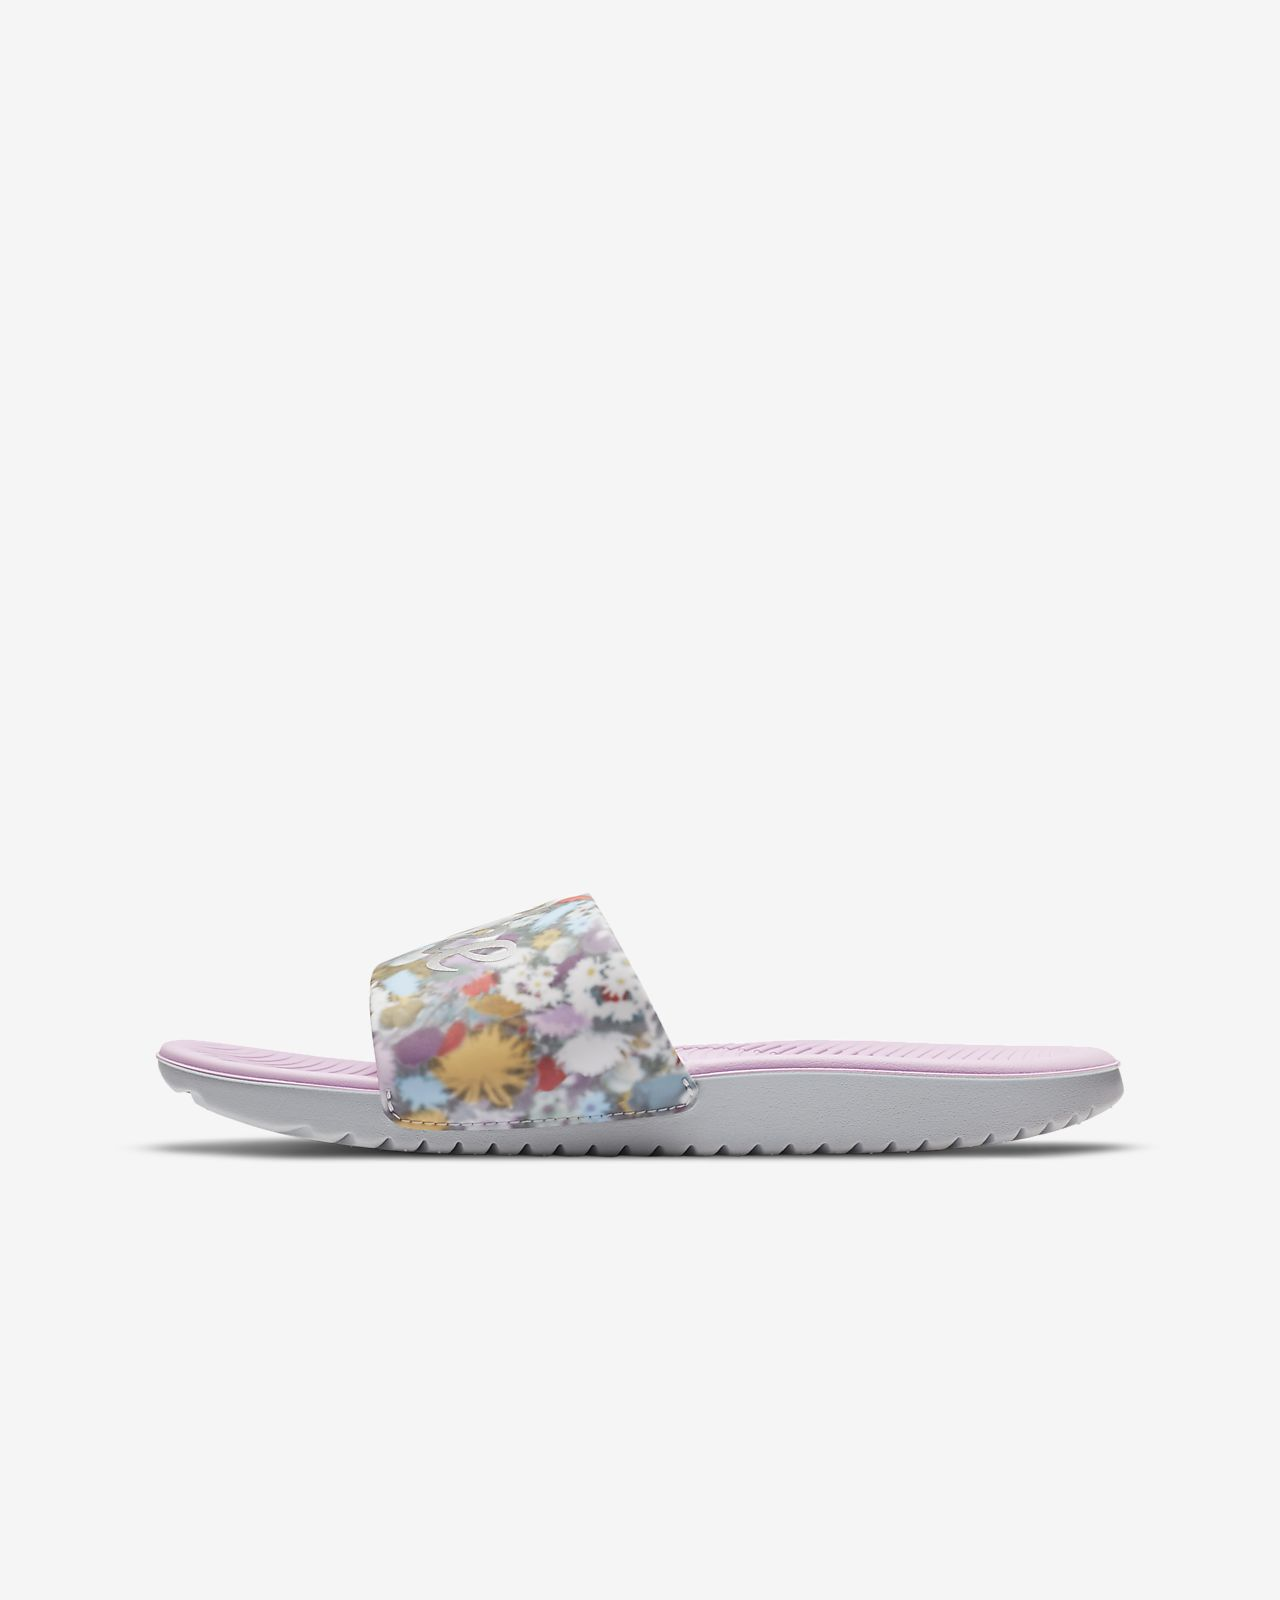 Nike Kawa Slide SE GS/PS 幼童/大童拖鞋